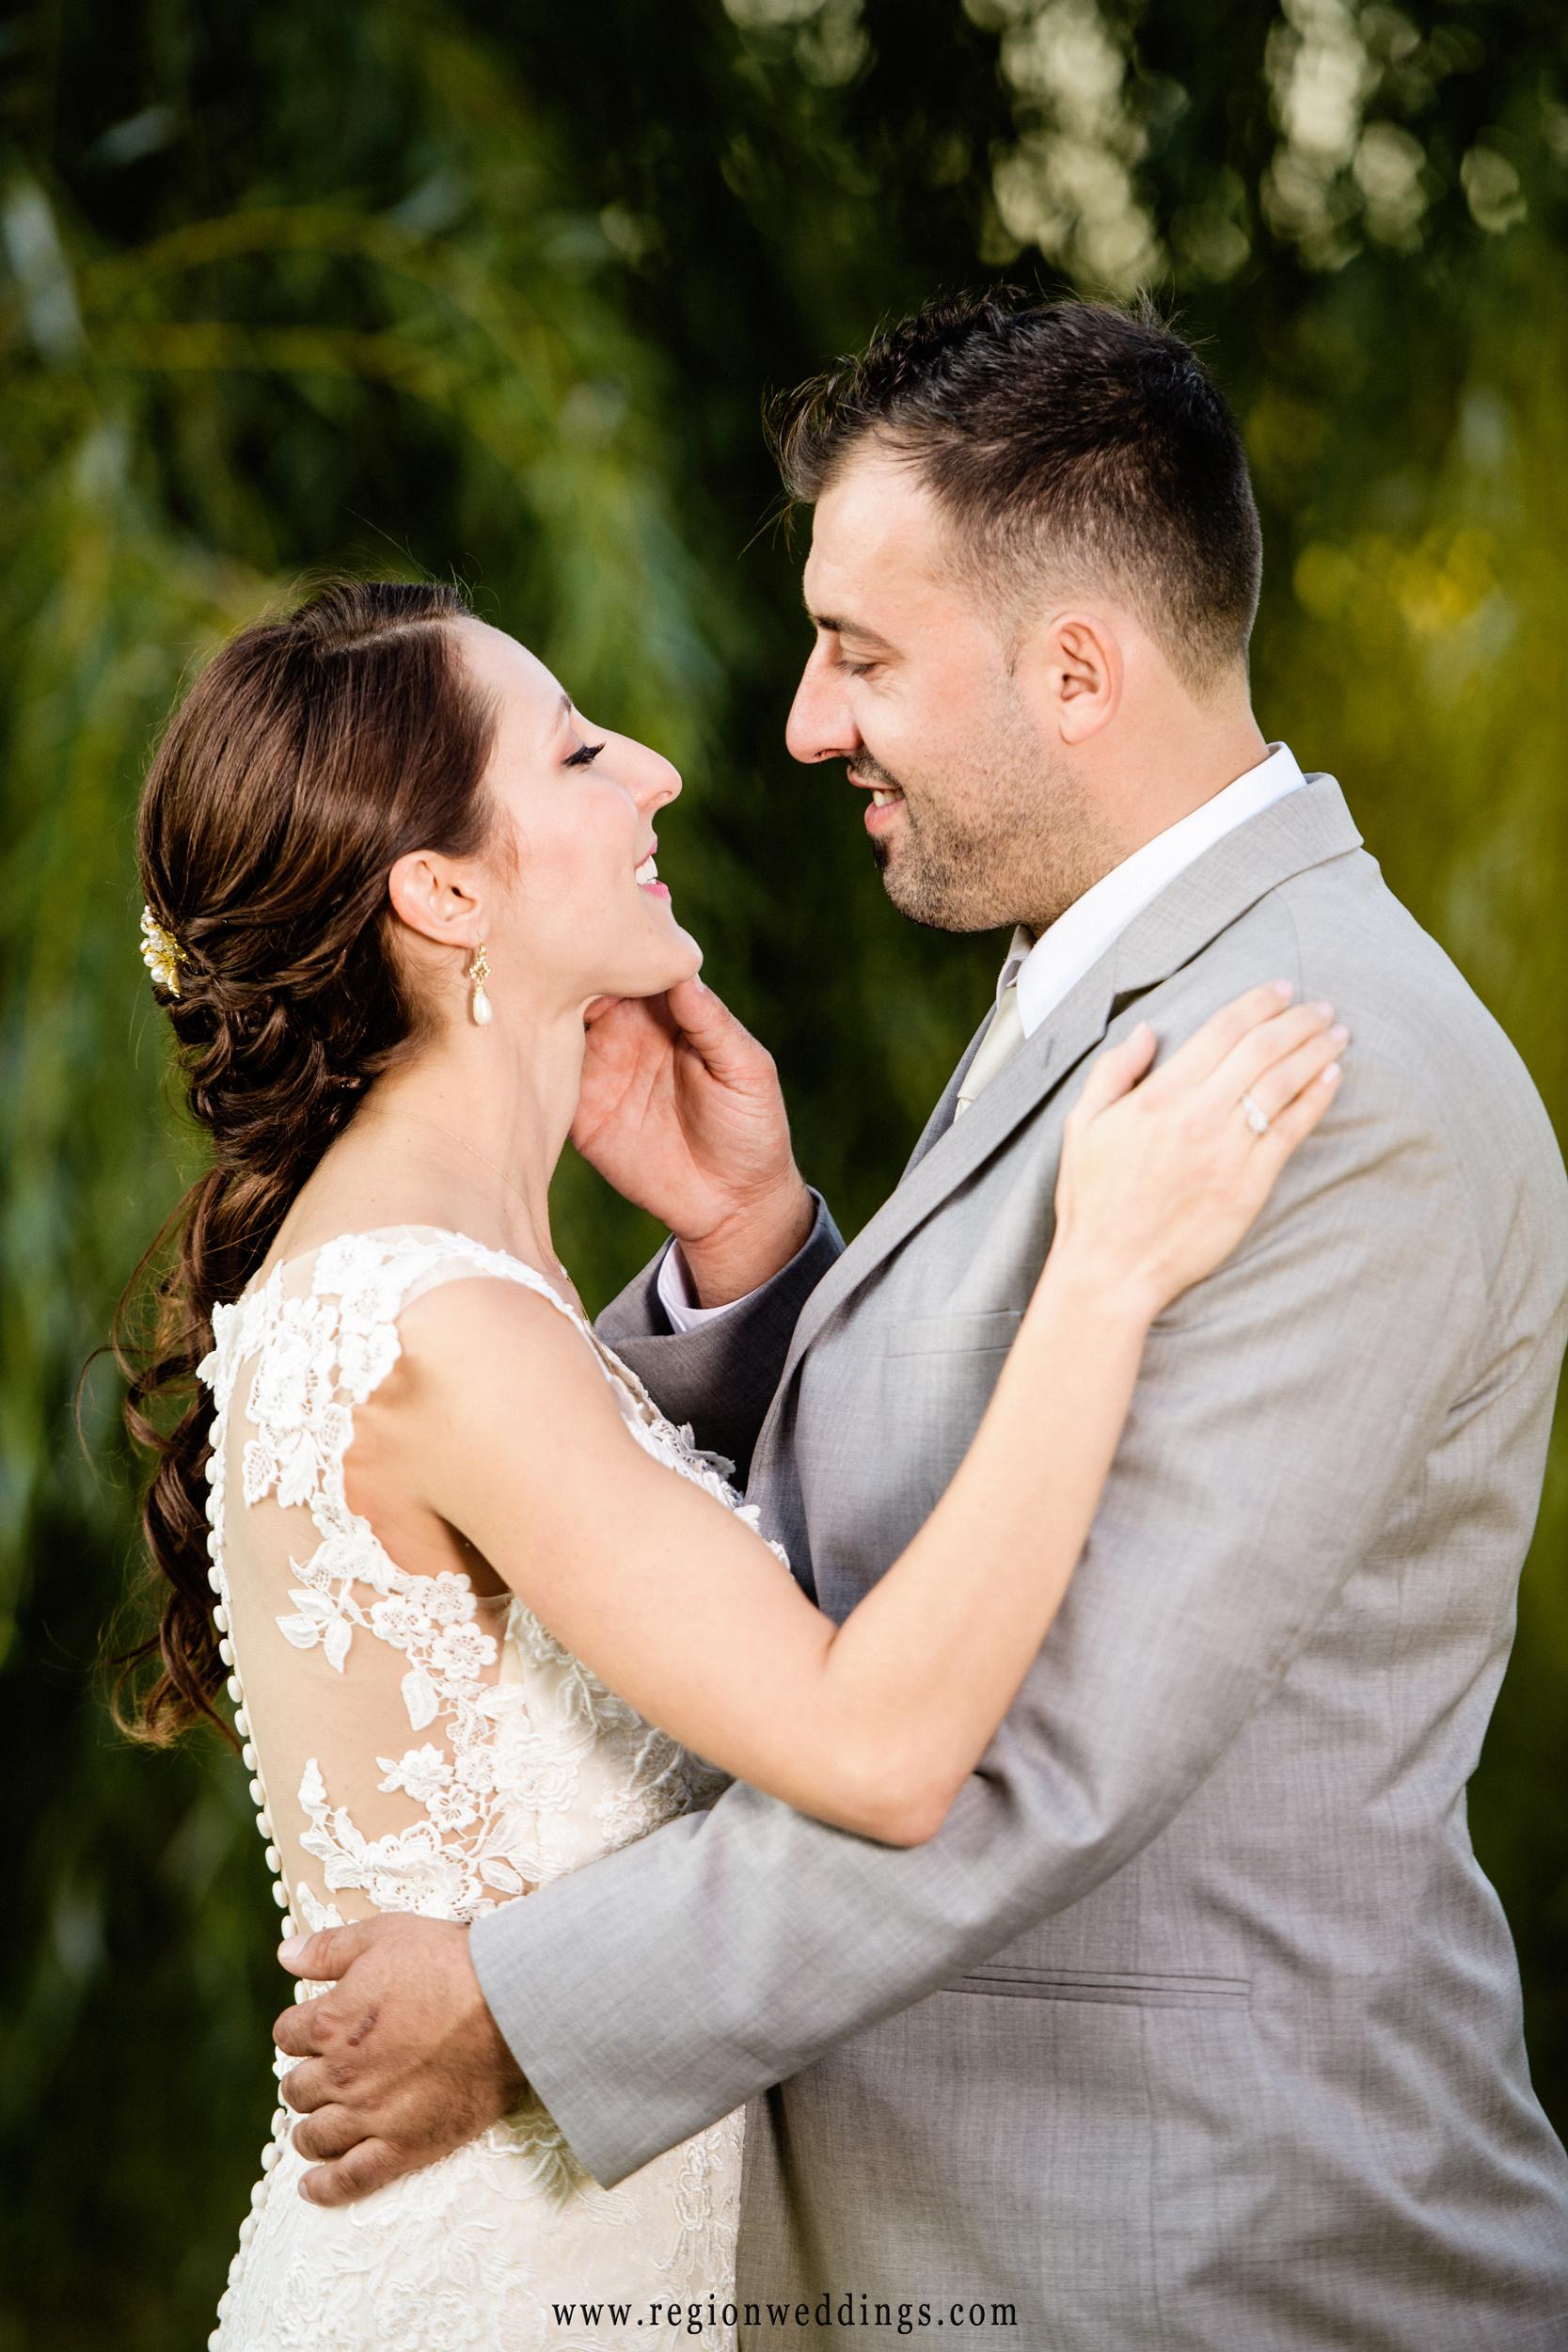 A joyous moment between bride and groom.